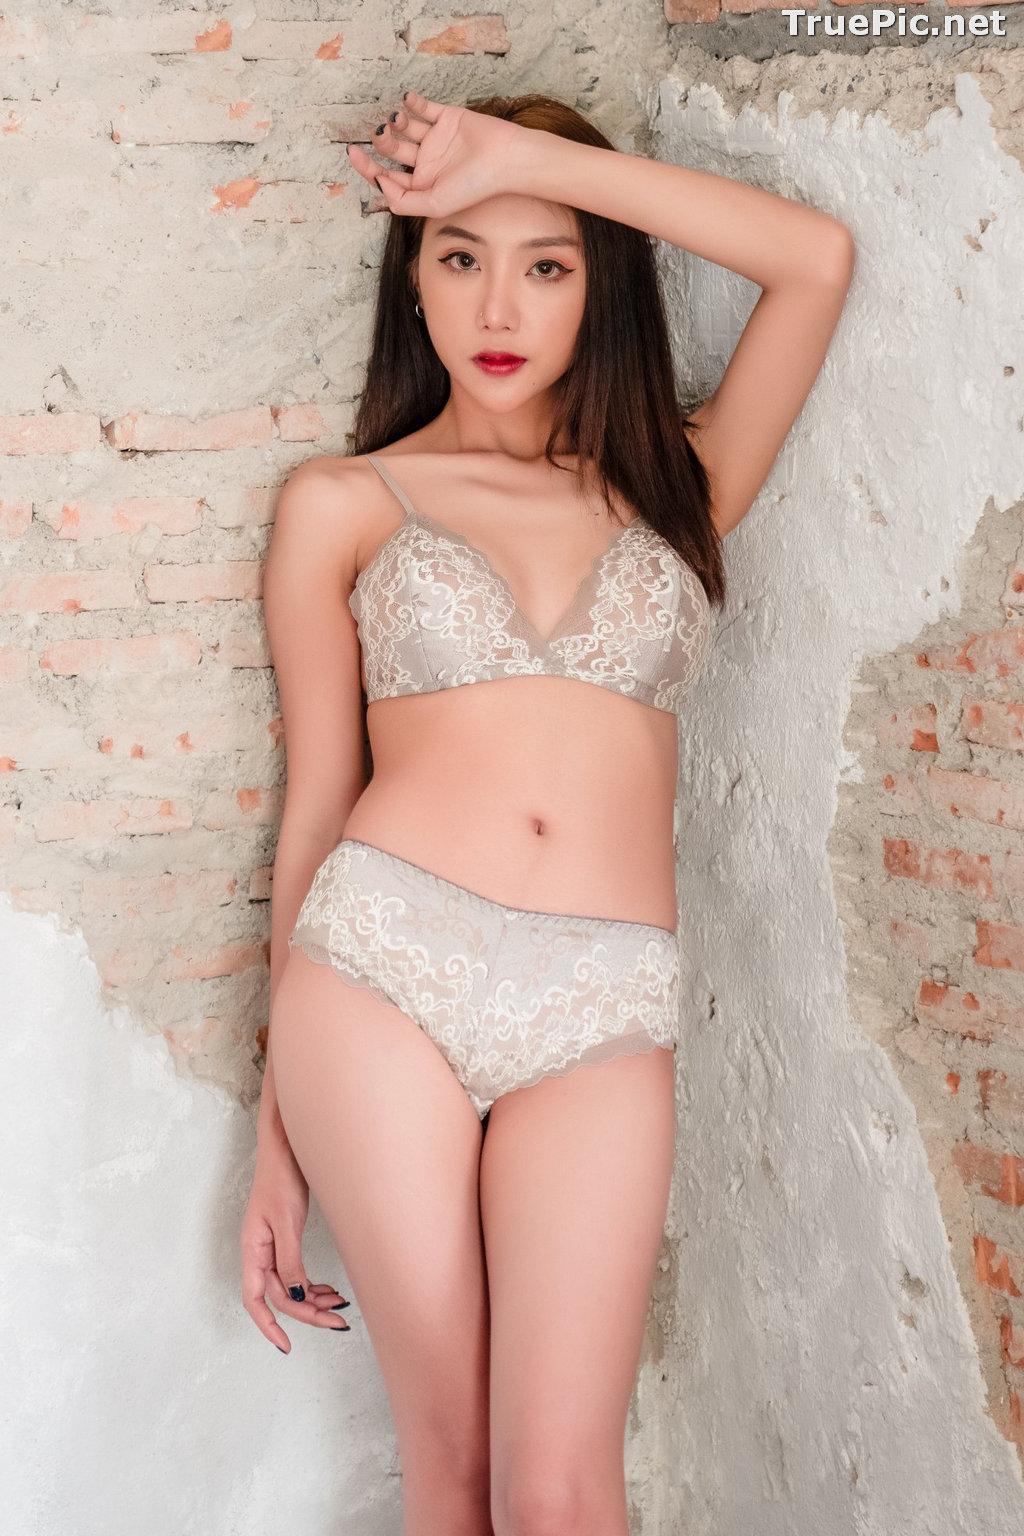 Image Thailand Model – Piyatida Rotjutharak (น้องตาร์) – Beautiful Picture 2021 Collection - TruePic.net - Picture-3